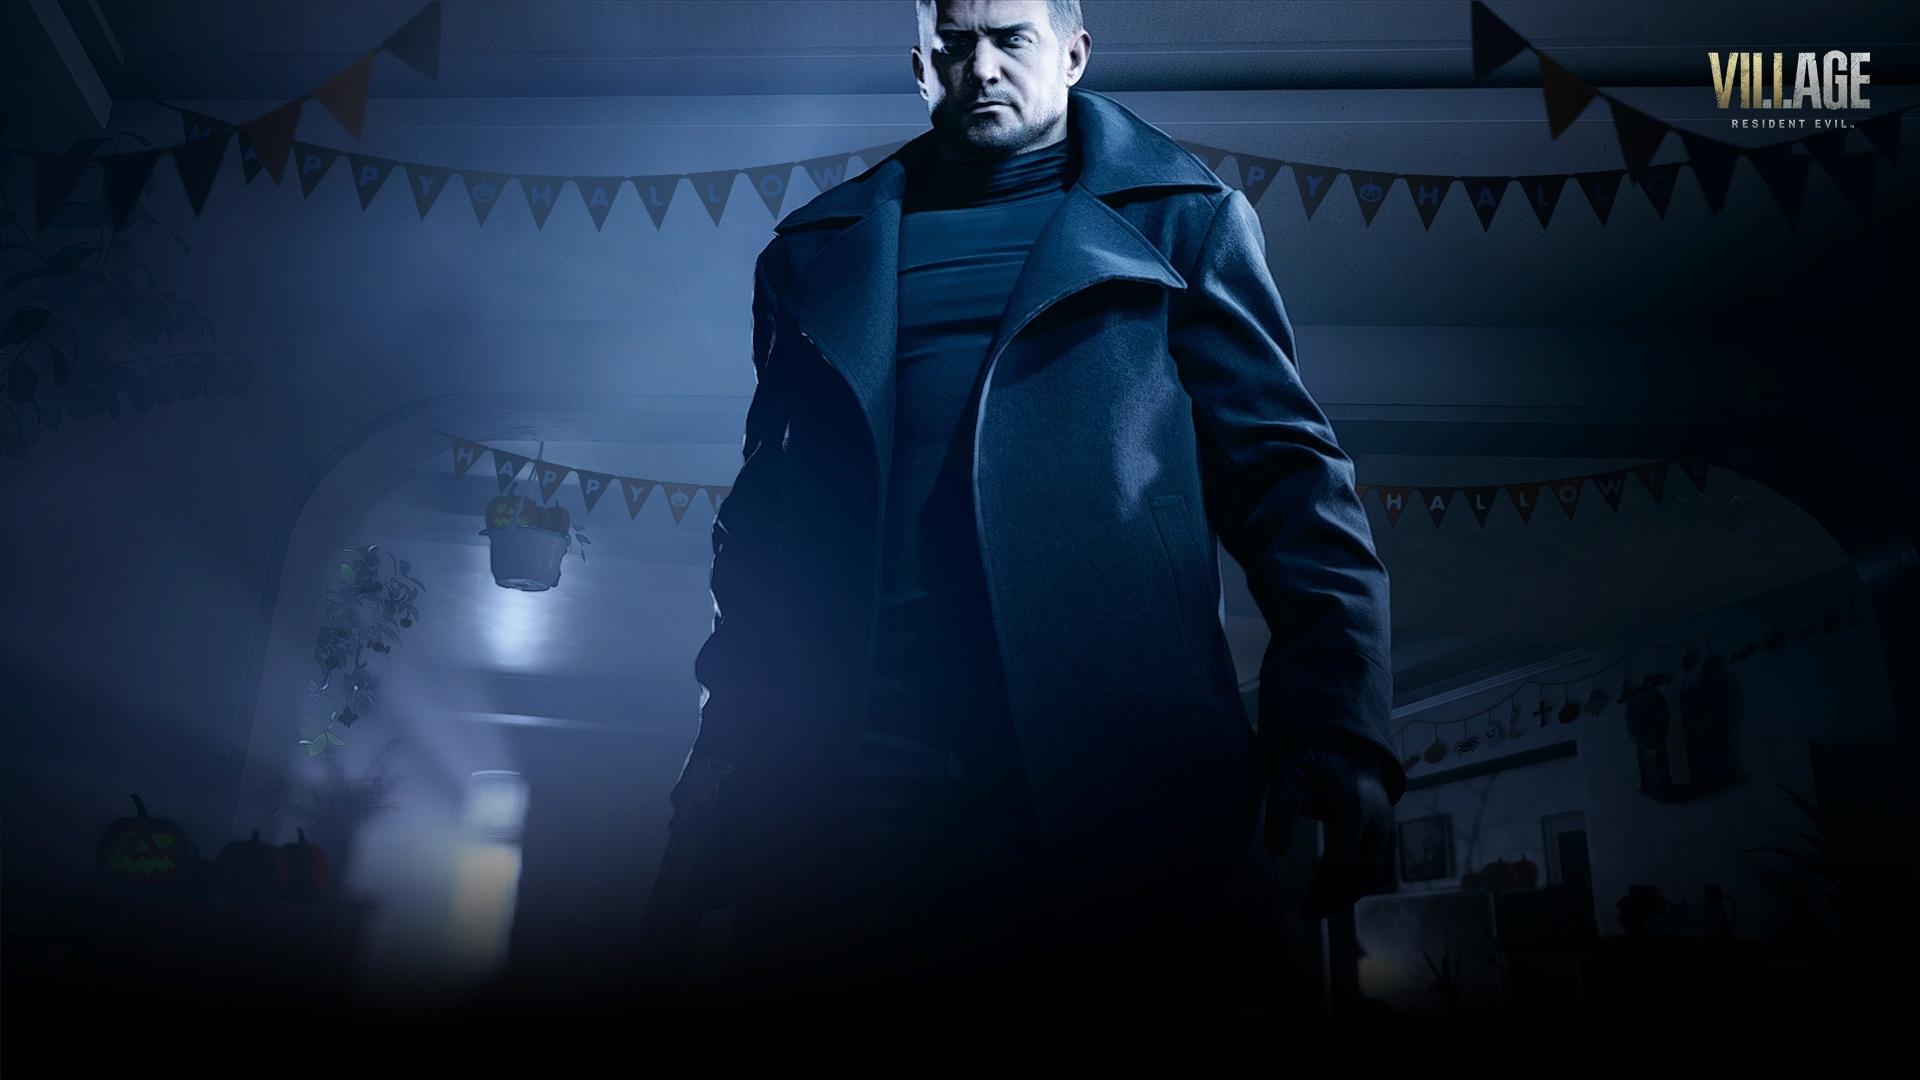 Resident Evil Village background picture